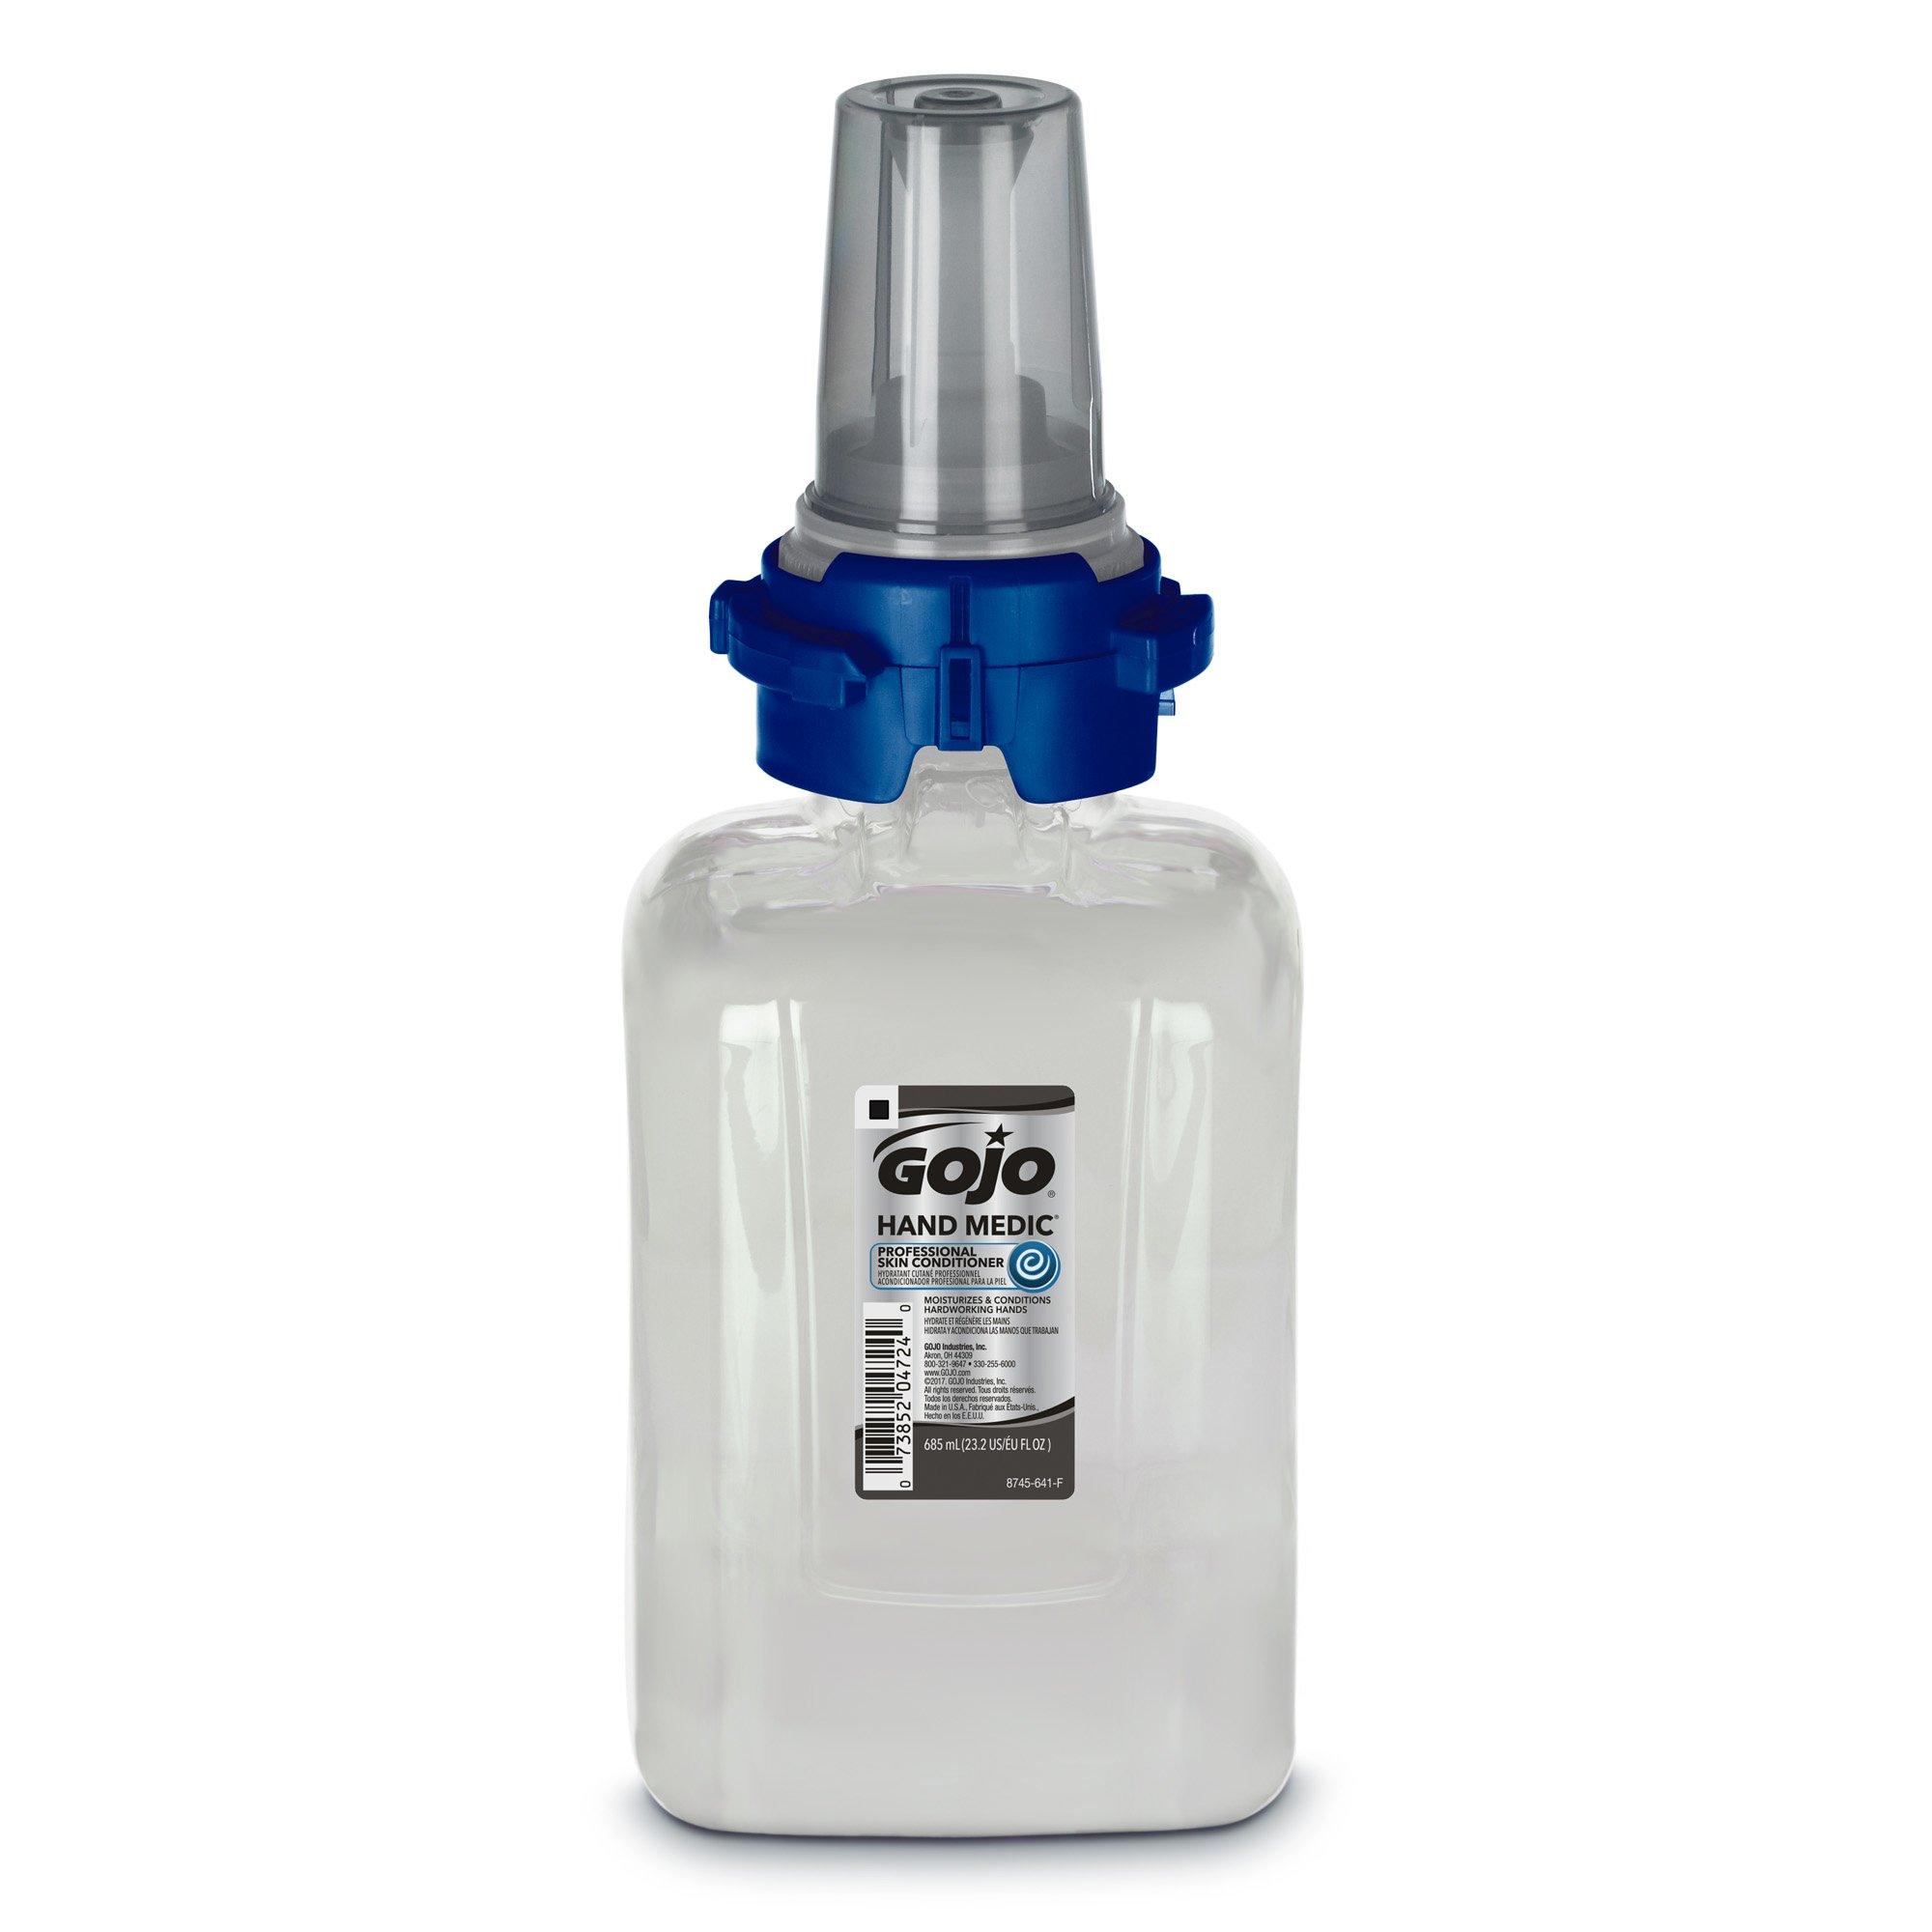 GOJO HAND MEDIC Professional Skin Conditioner 685 mL Refill for GOJO HAND MEDIC ADX-7 Dispenser - Heavy Duty Hand Conditioner by Gojo